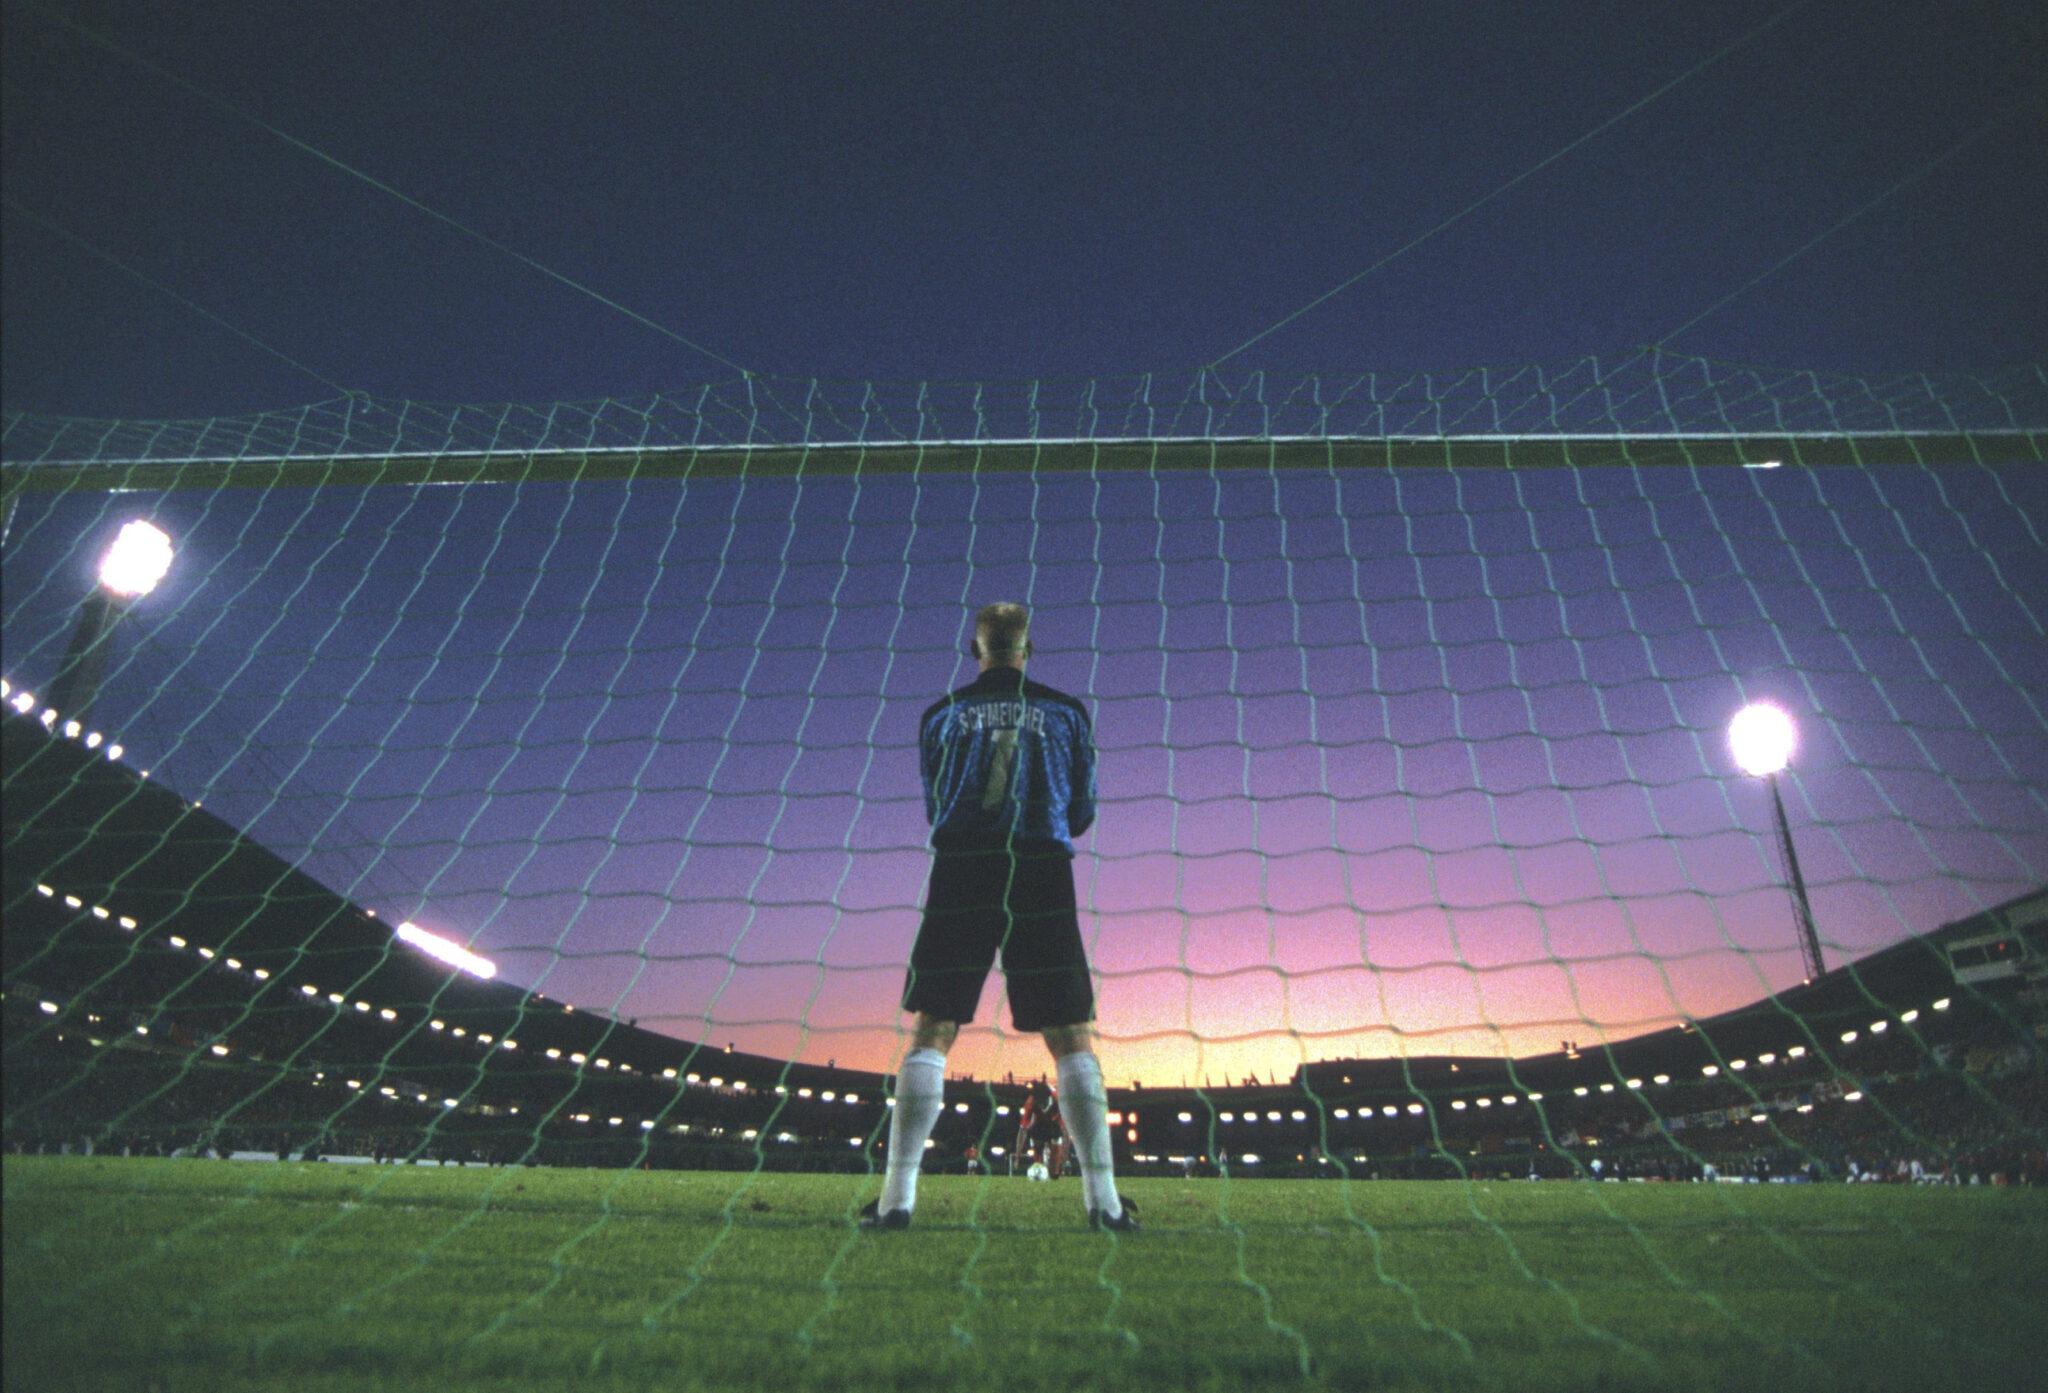 Rigori Danimarca vs Olanda - Foto Lutz Bongarts Getty Images OneFootball